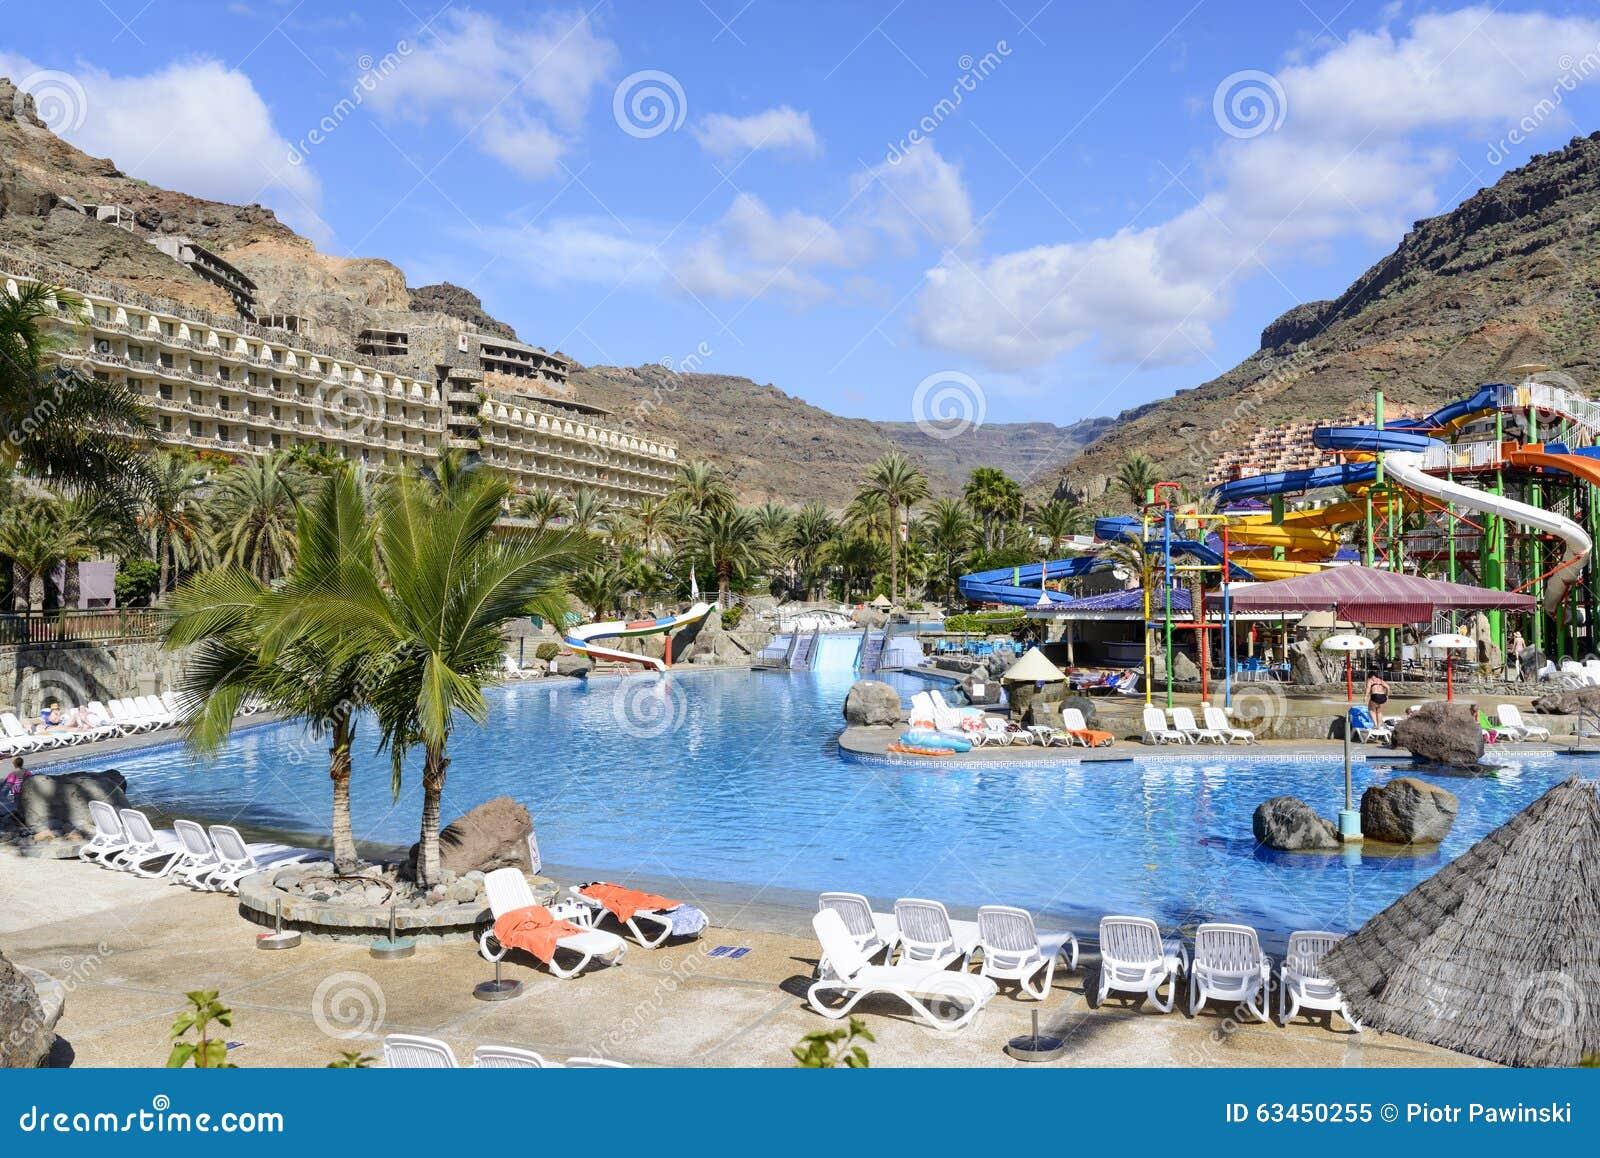 The lago taurito parque acuatico editorial image image - Gran canaria weather november ...